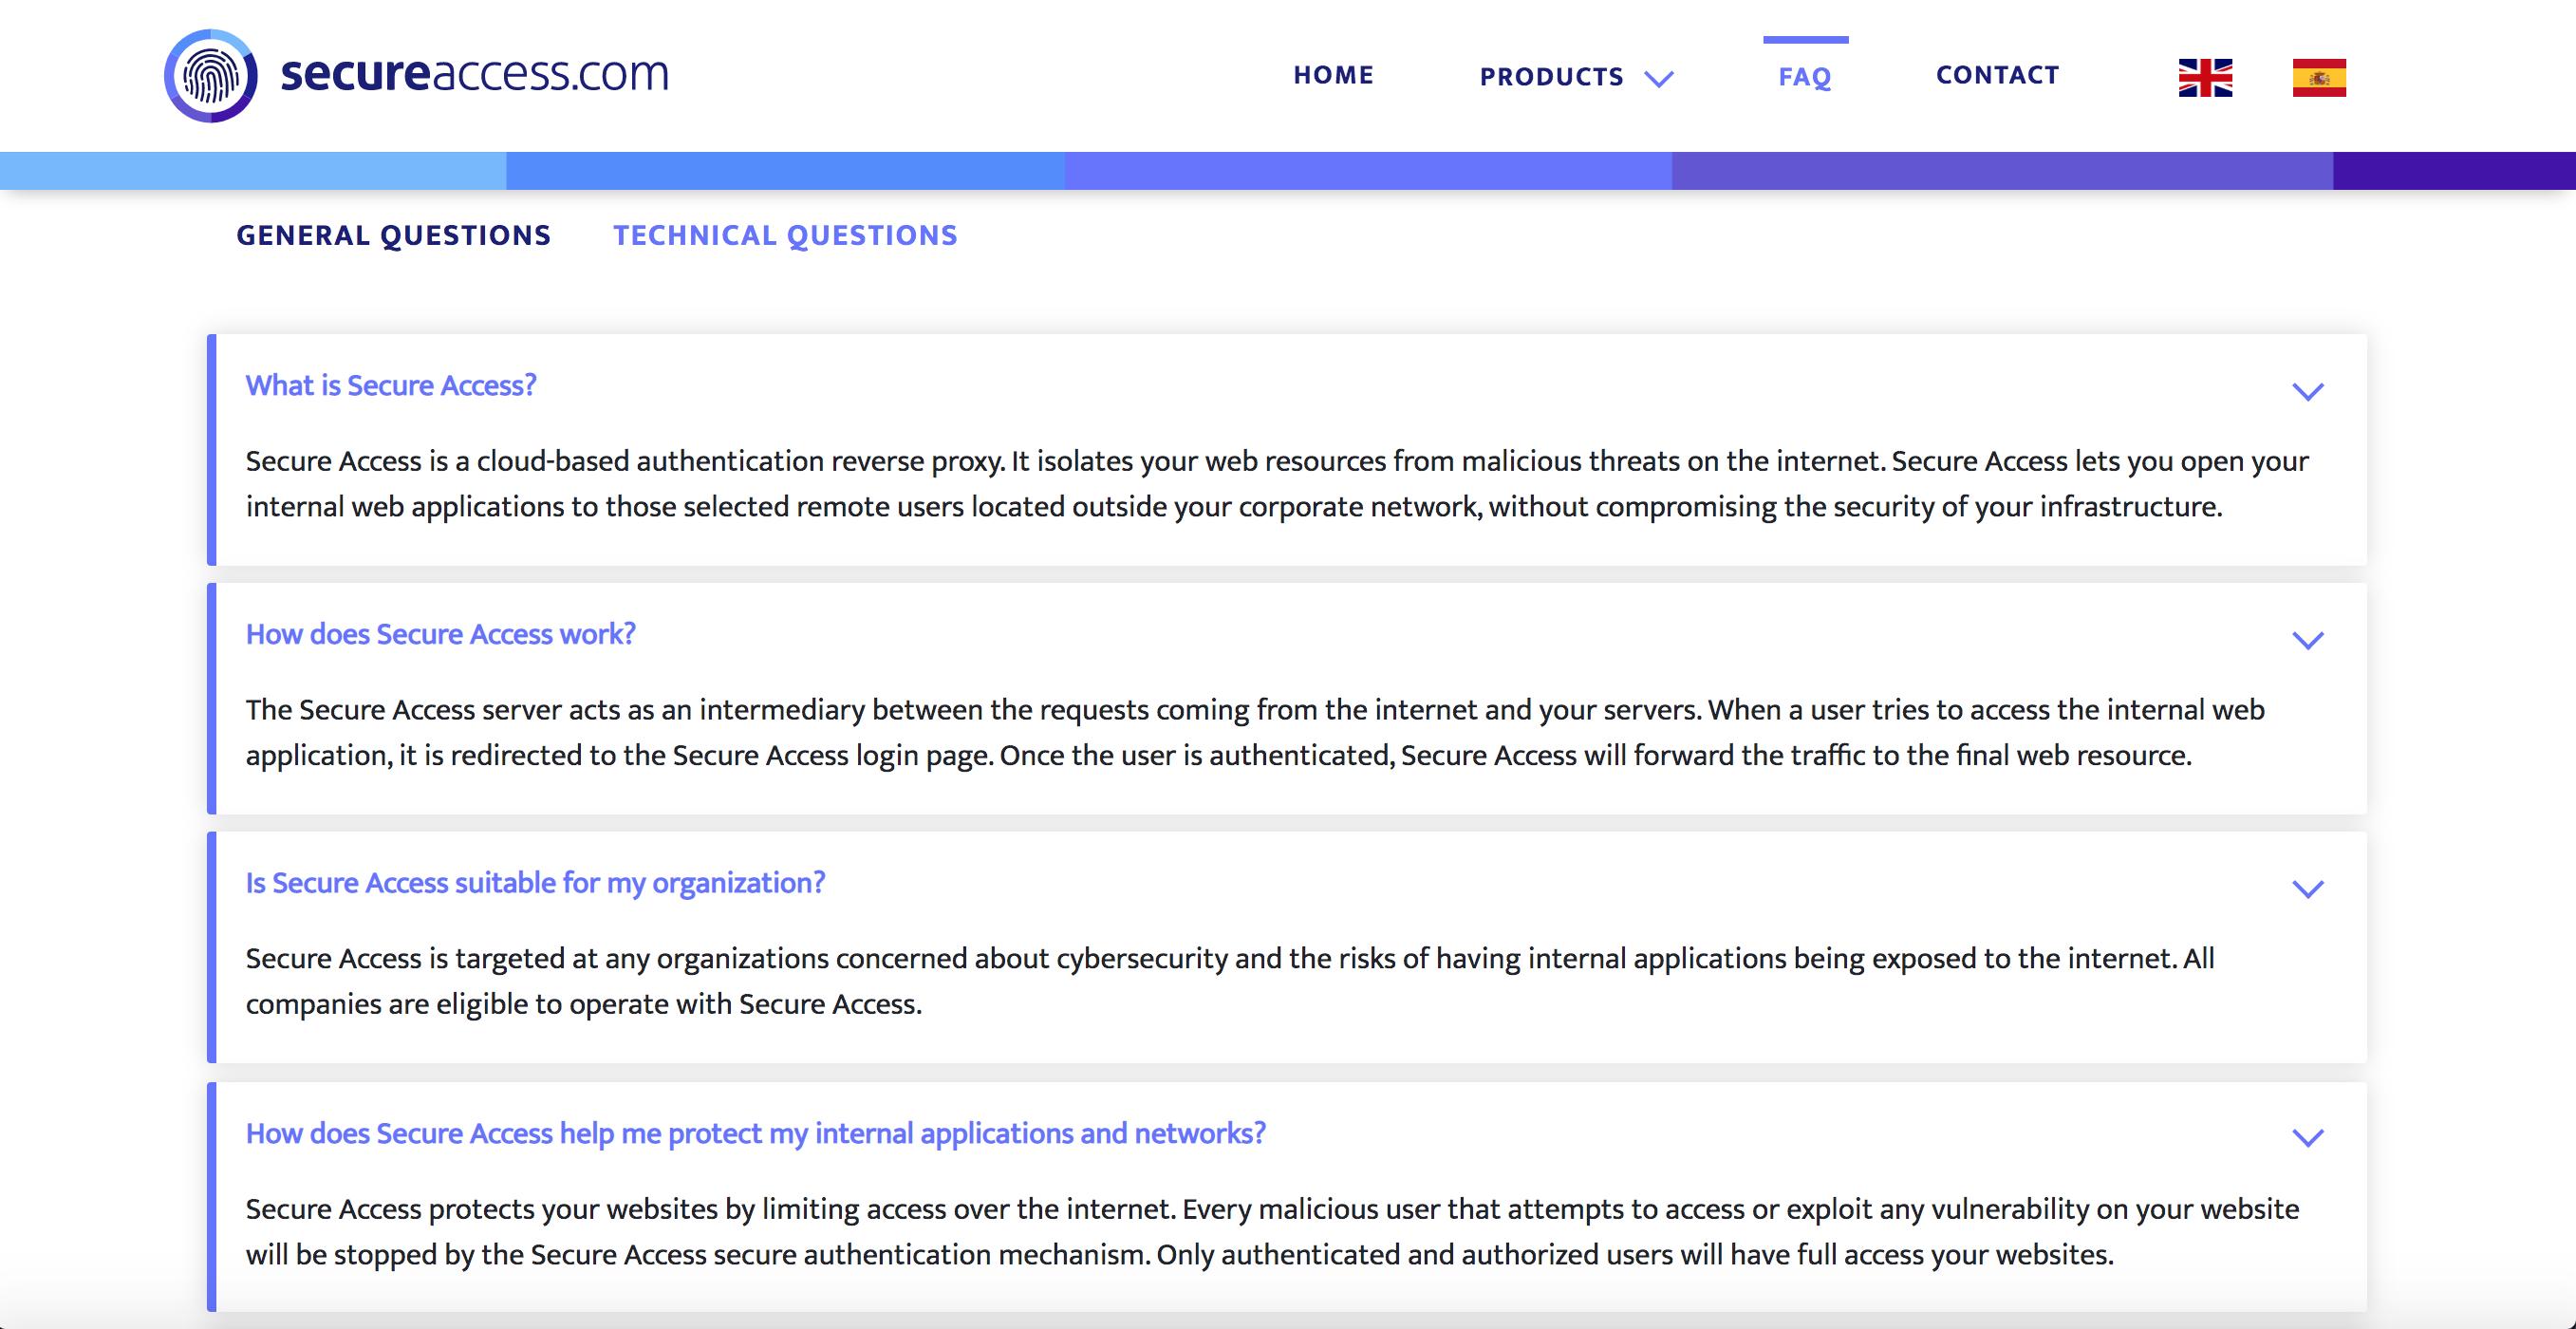 SecureAccess FAQs